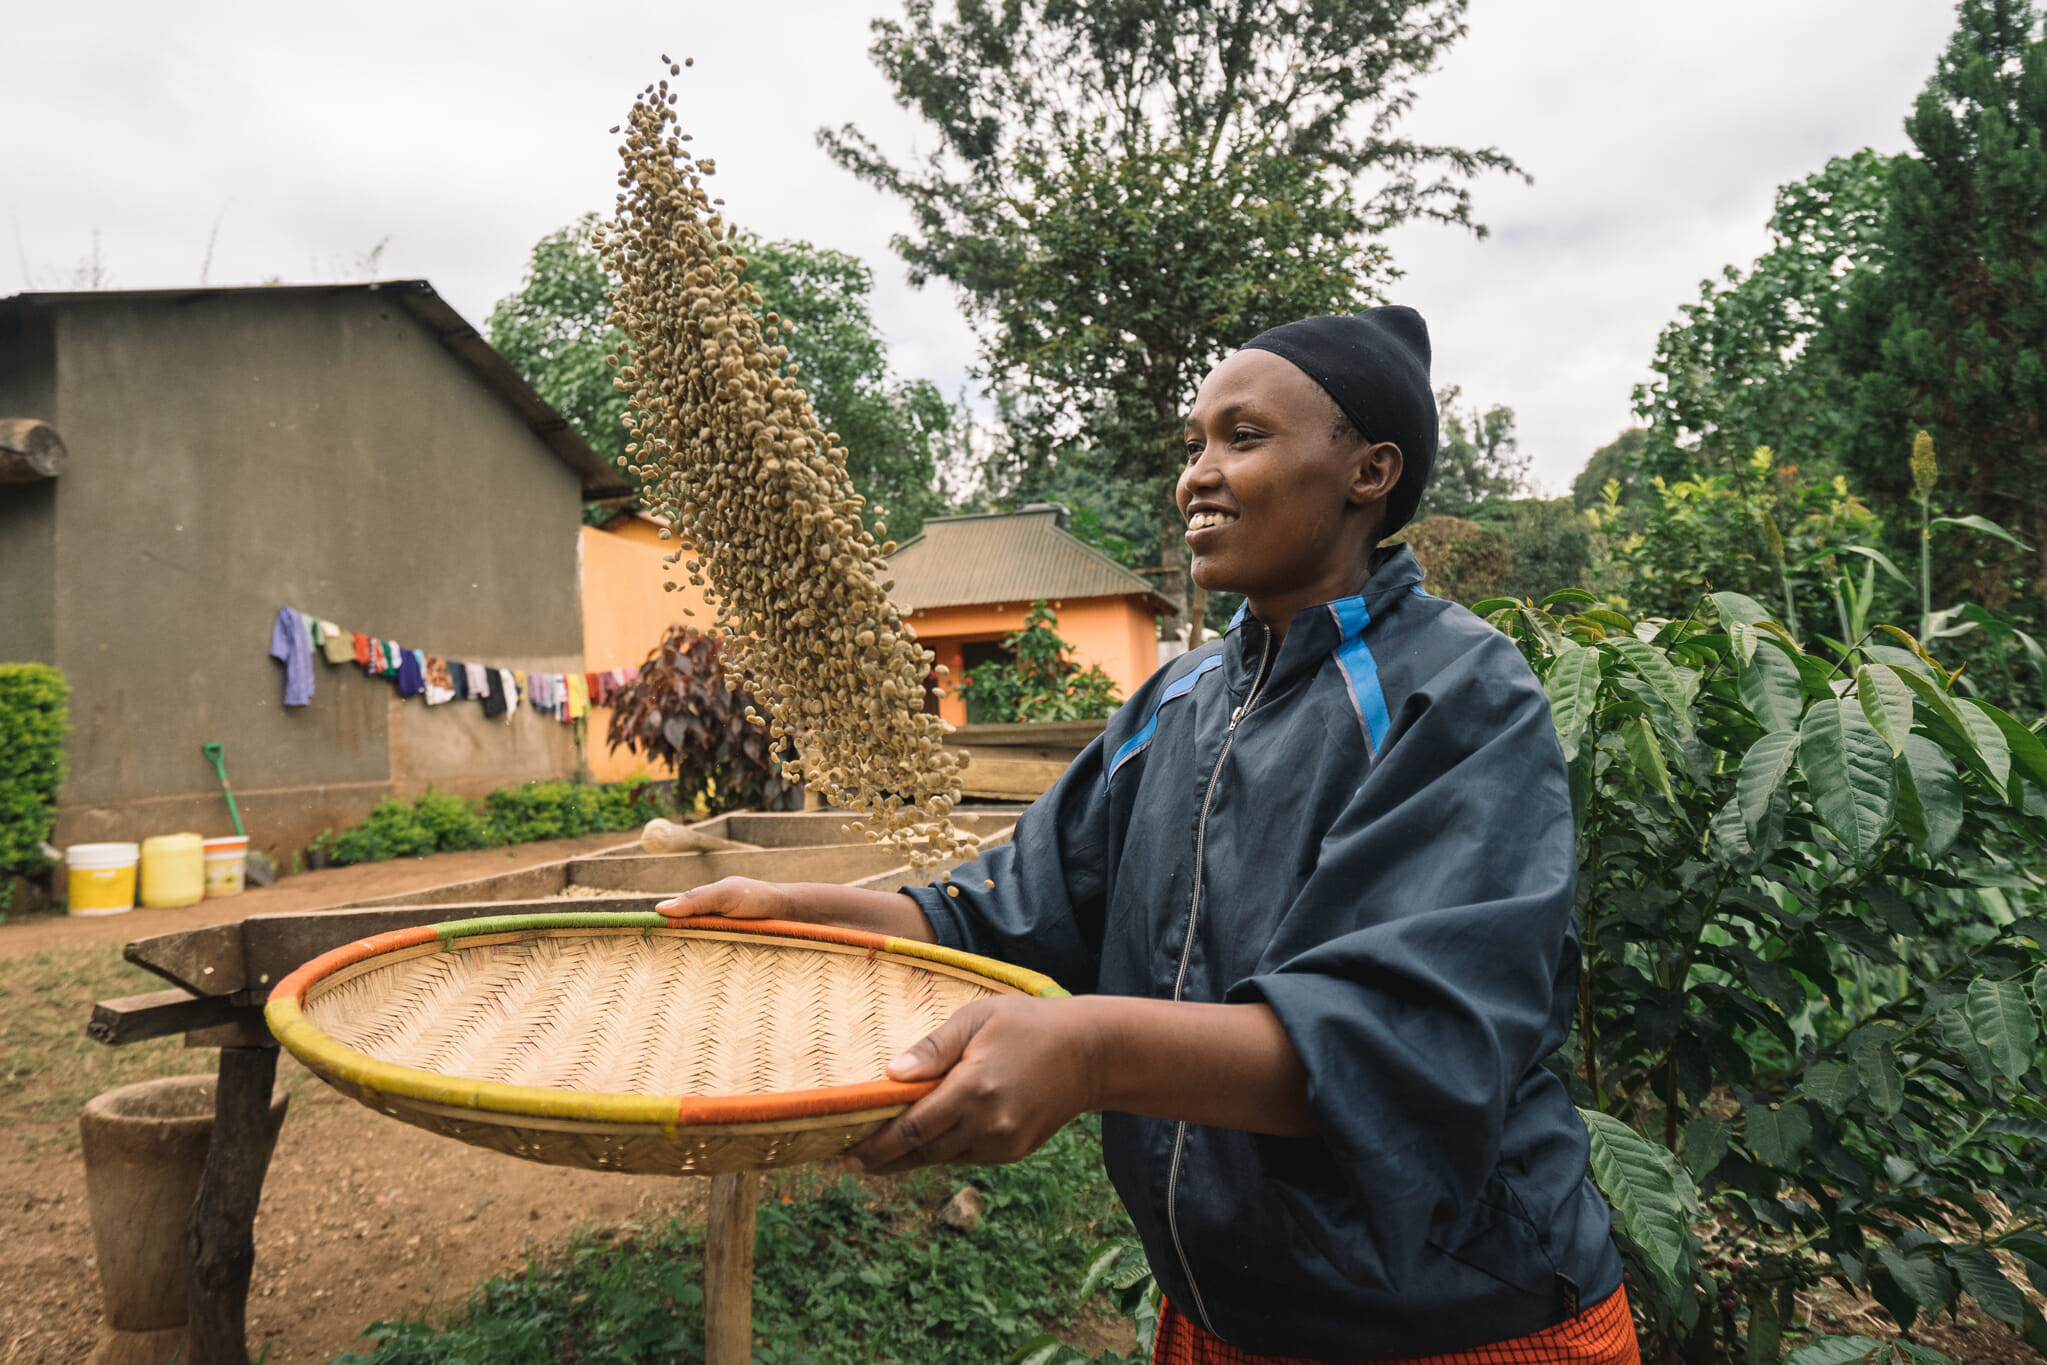 voyage-tanzanie-explore-le-monde-endallah-cafe